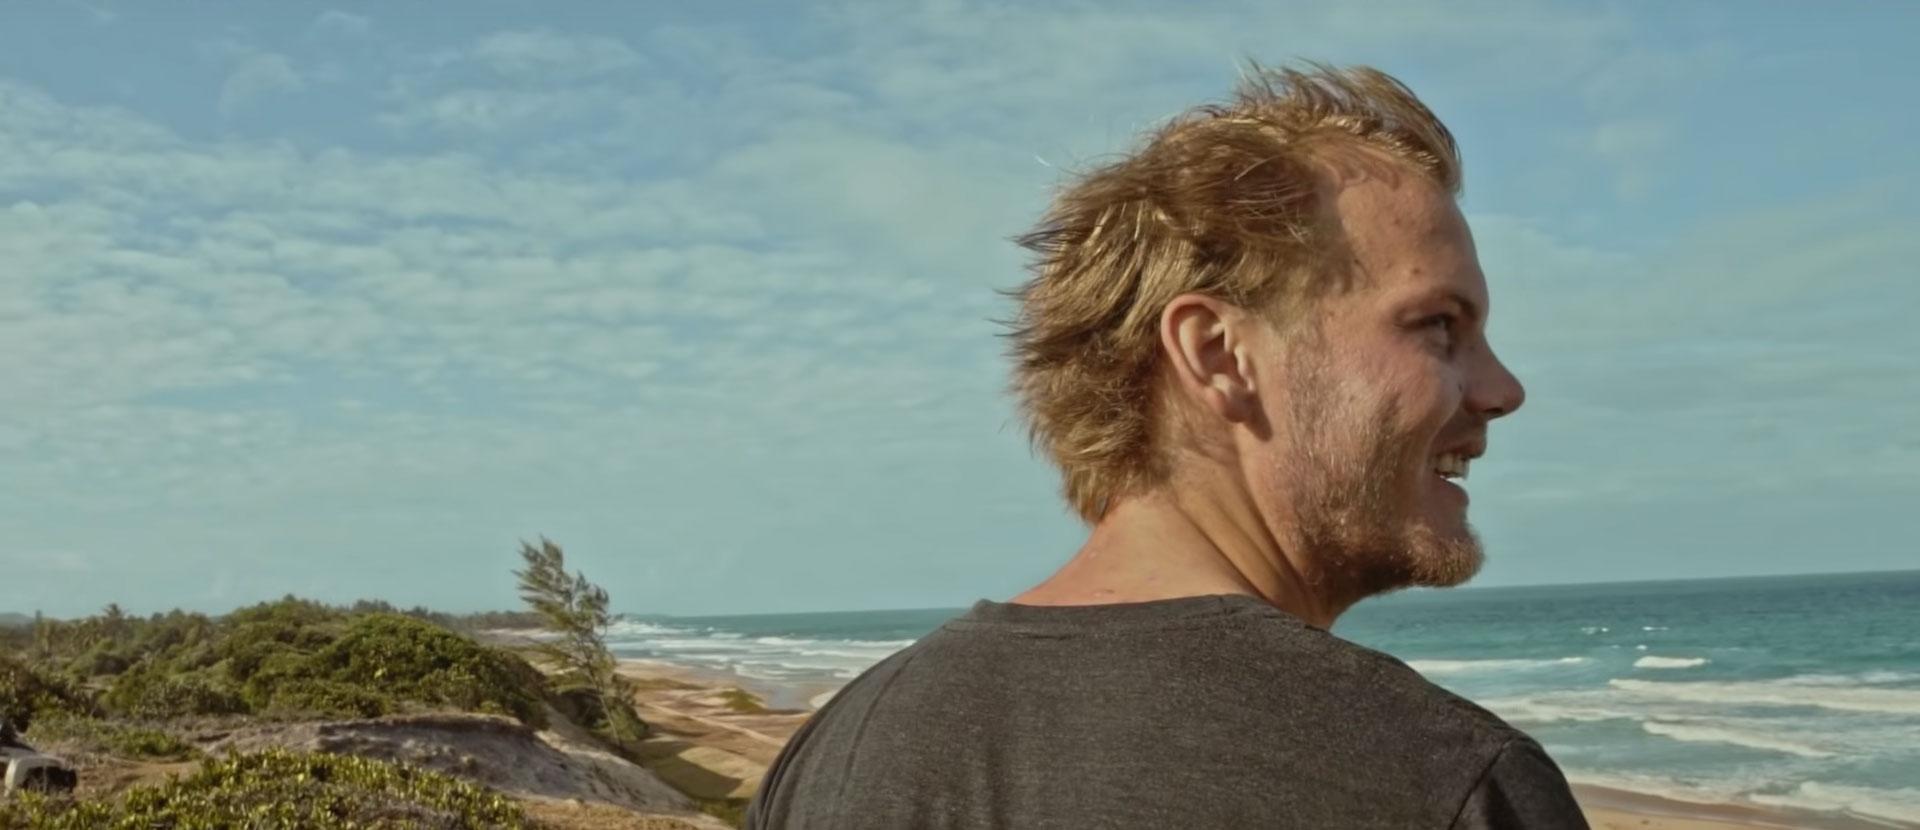 Avicii Heaven music video Chris Martin Coldplay